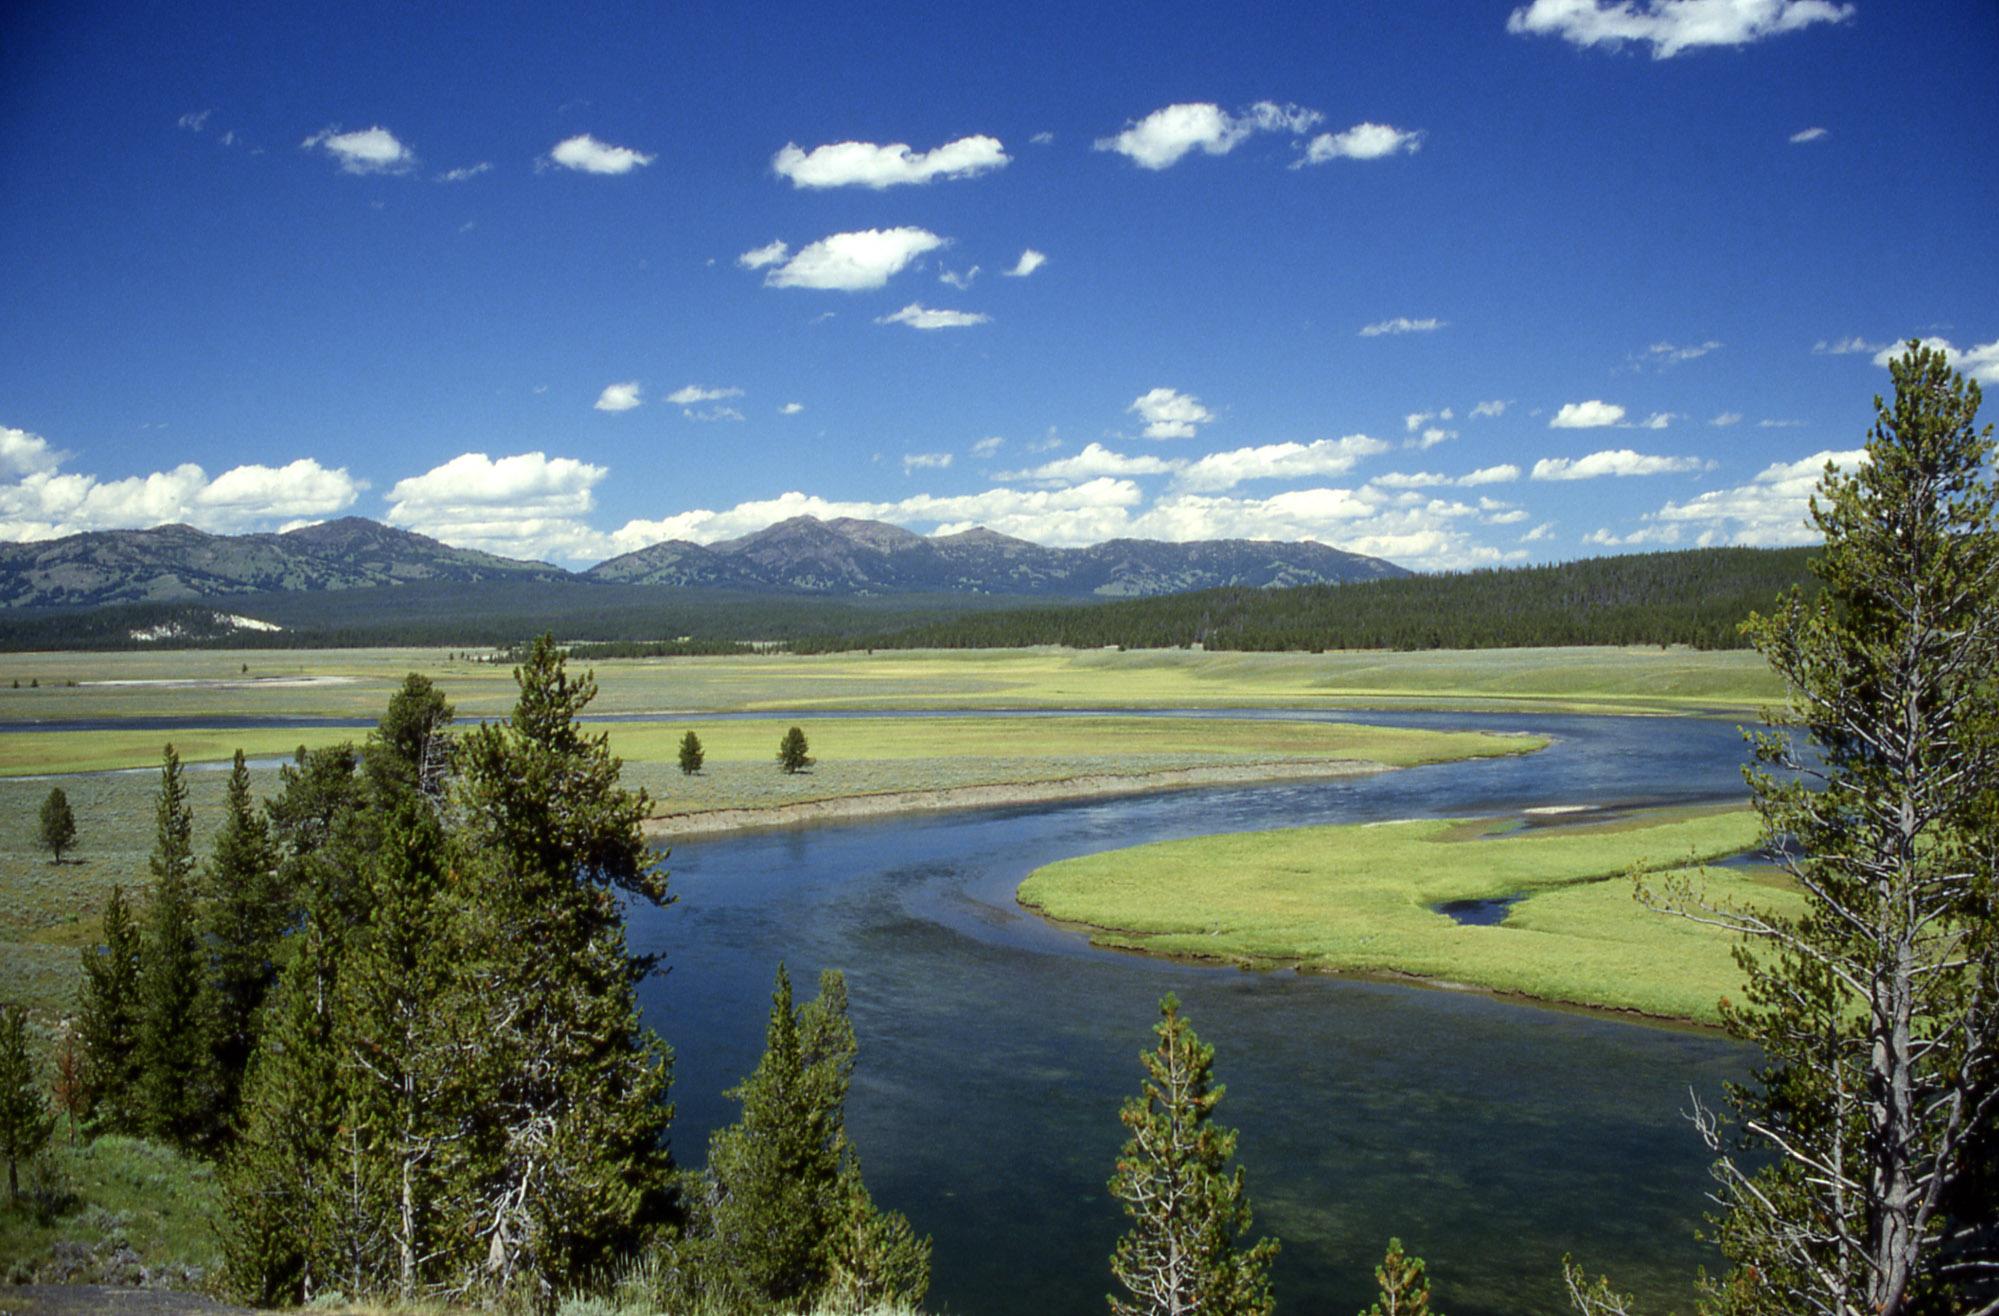 Yellowstone_River_in_Hayden_Valley